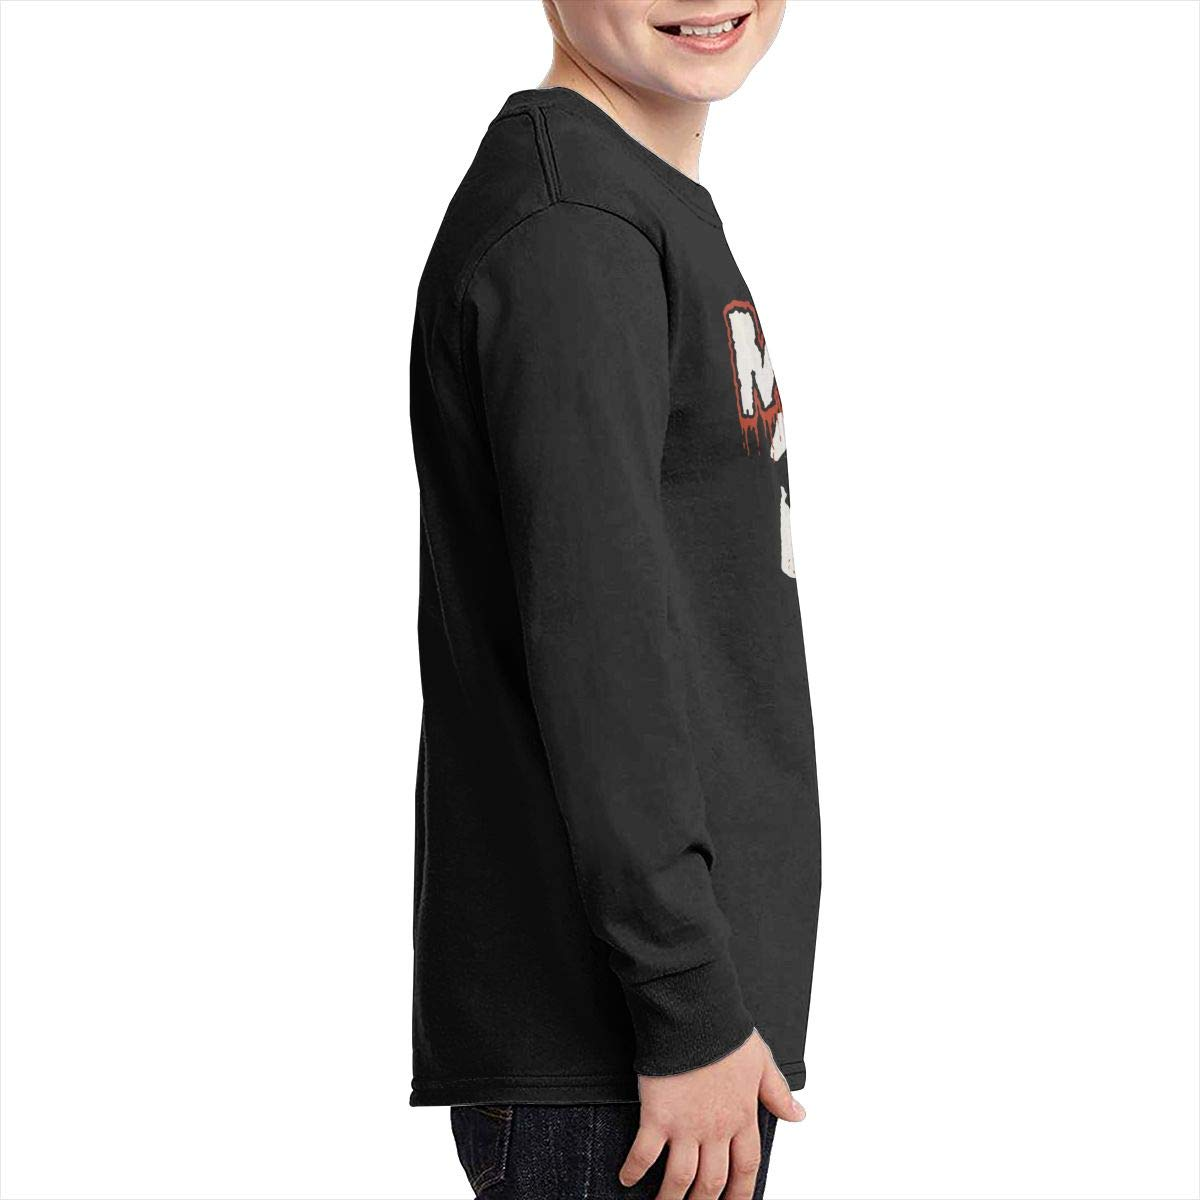 Misfits Boys Fashion Classic Long Sleeve T-Shirt Boy Long Sleeve Cotton Round Neck T-Shirt